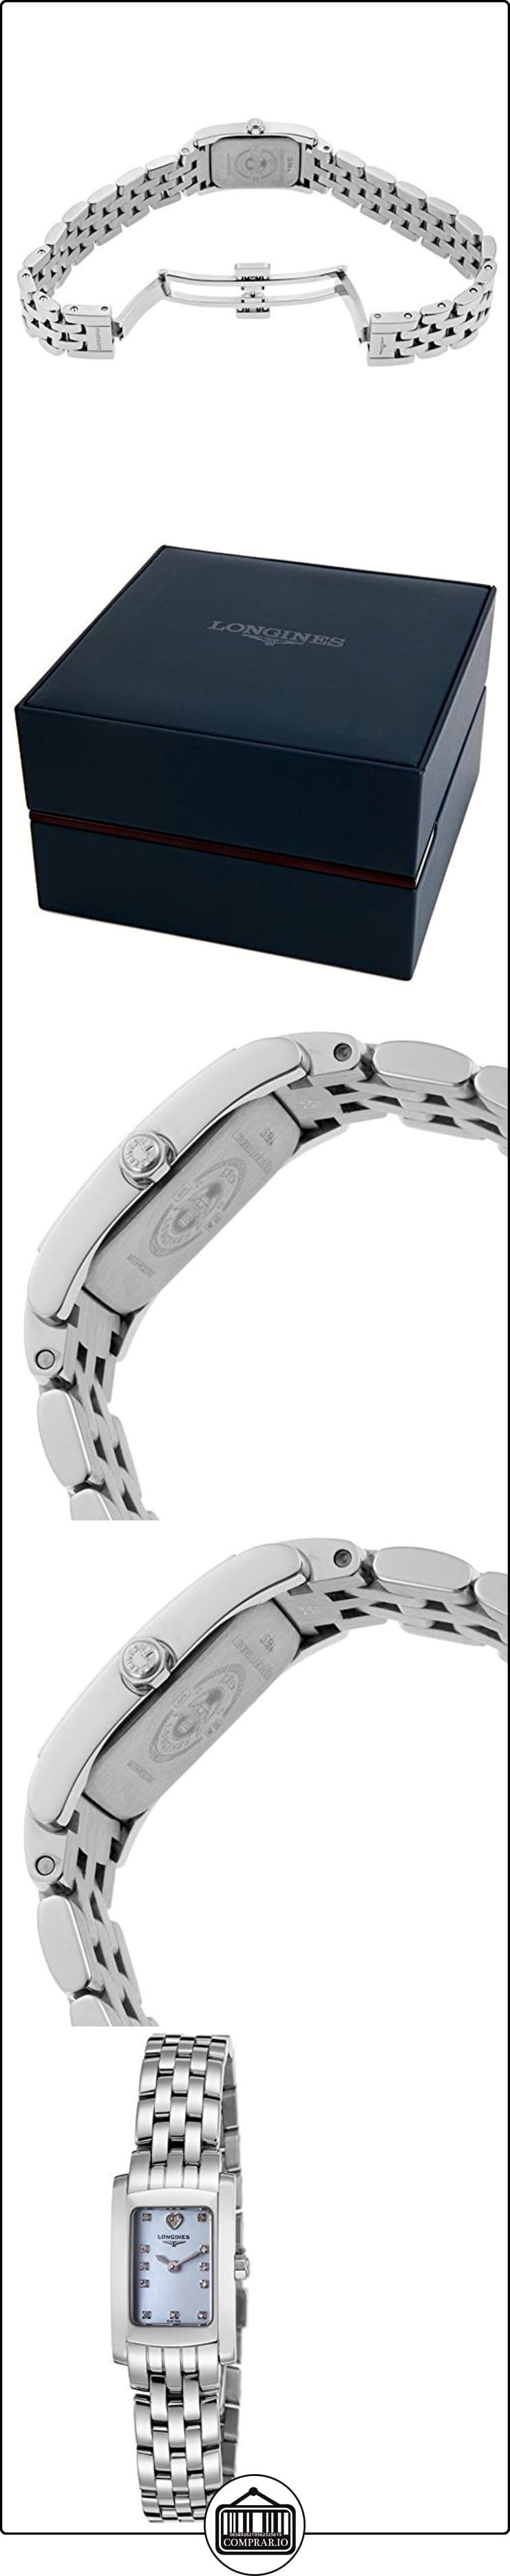 Longines l5.158.4.92.6  ✿ Relojes para mujer - (Lujo) ✿